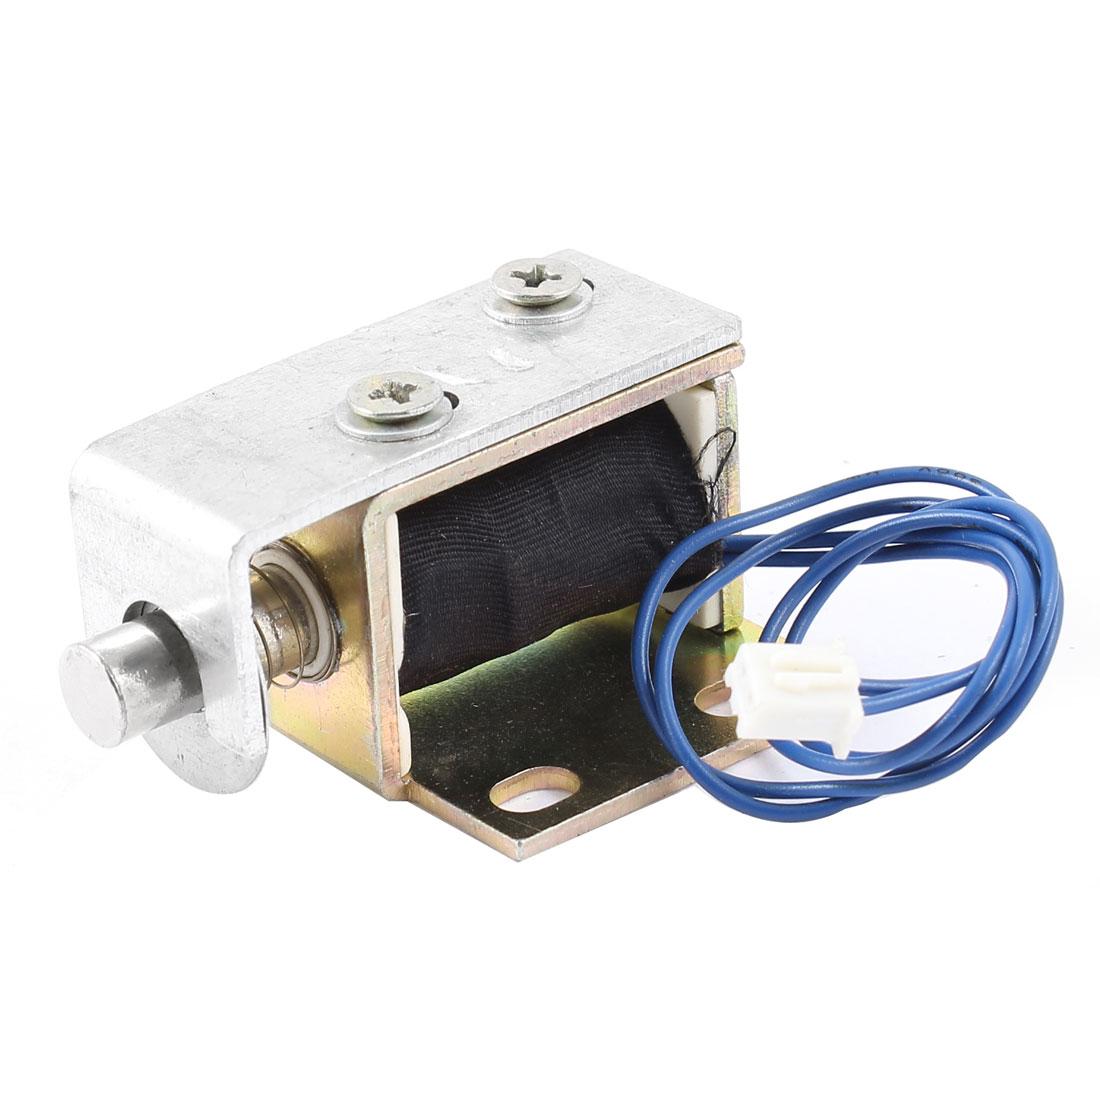 1mm/200g 11mm/50g 1.8W Spring Plunger Pull Type Solenoid Electromagnet DC 6V 0.3A